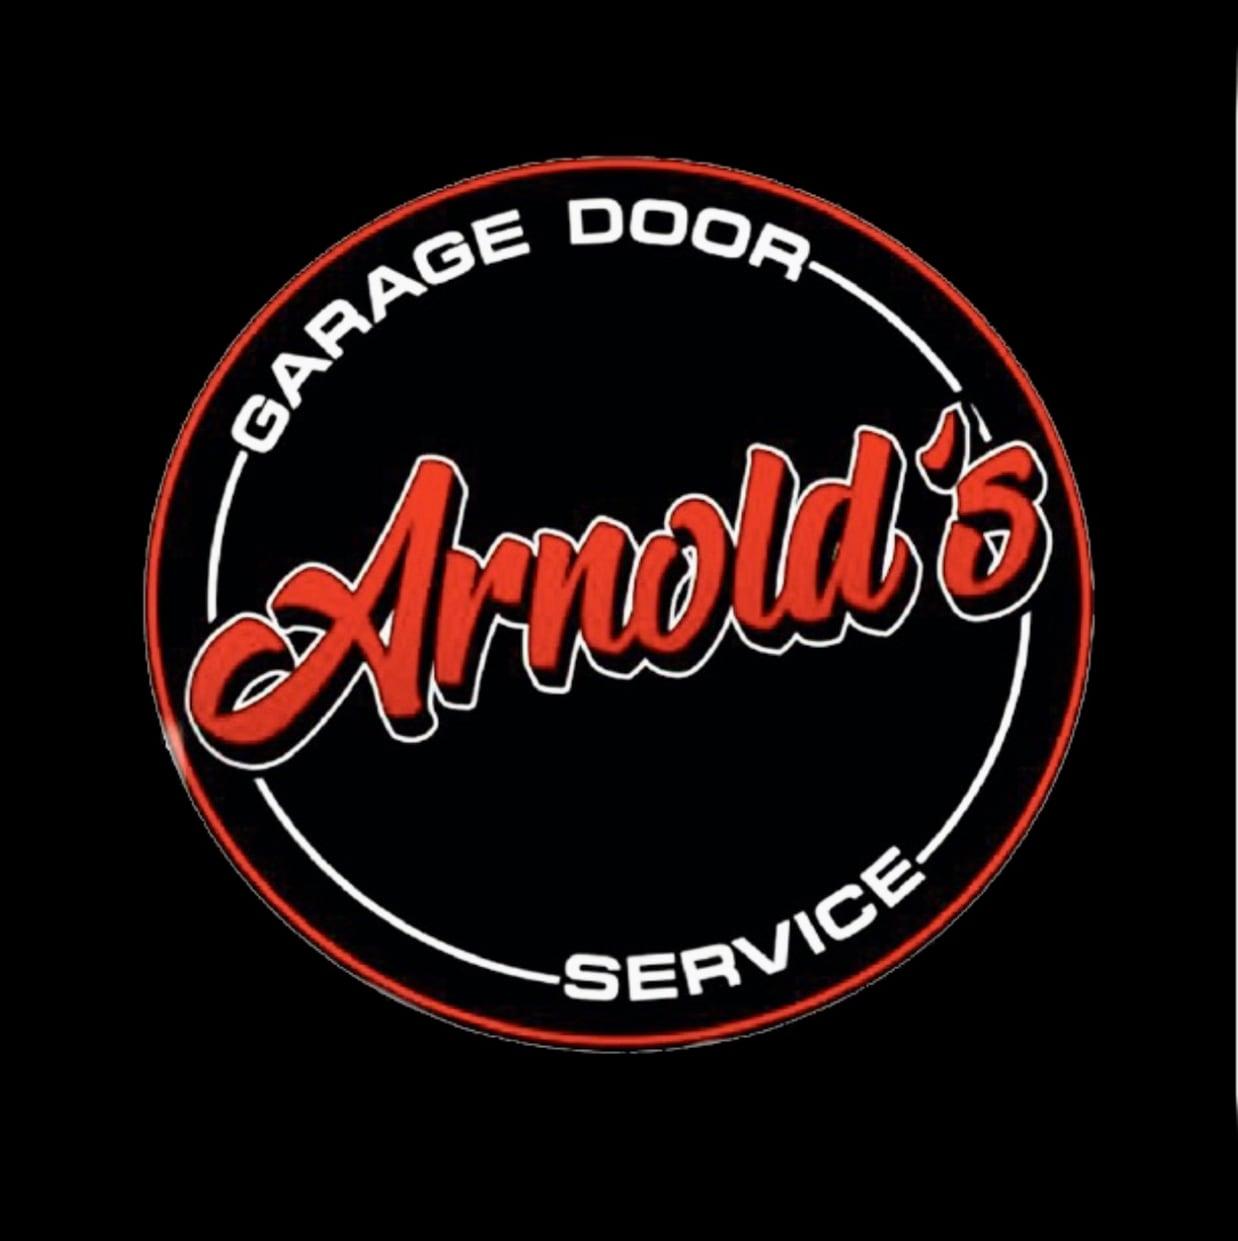 ARNOLDS GARAGE DOOR SERVICES